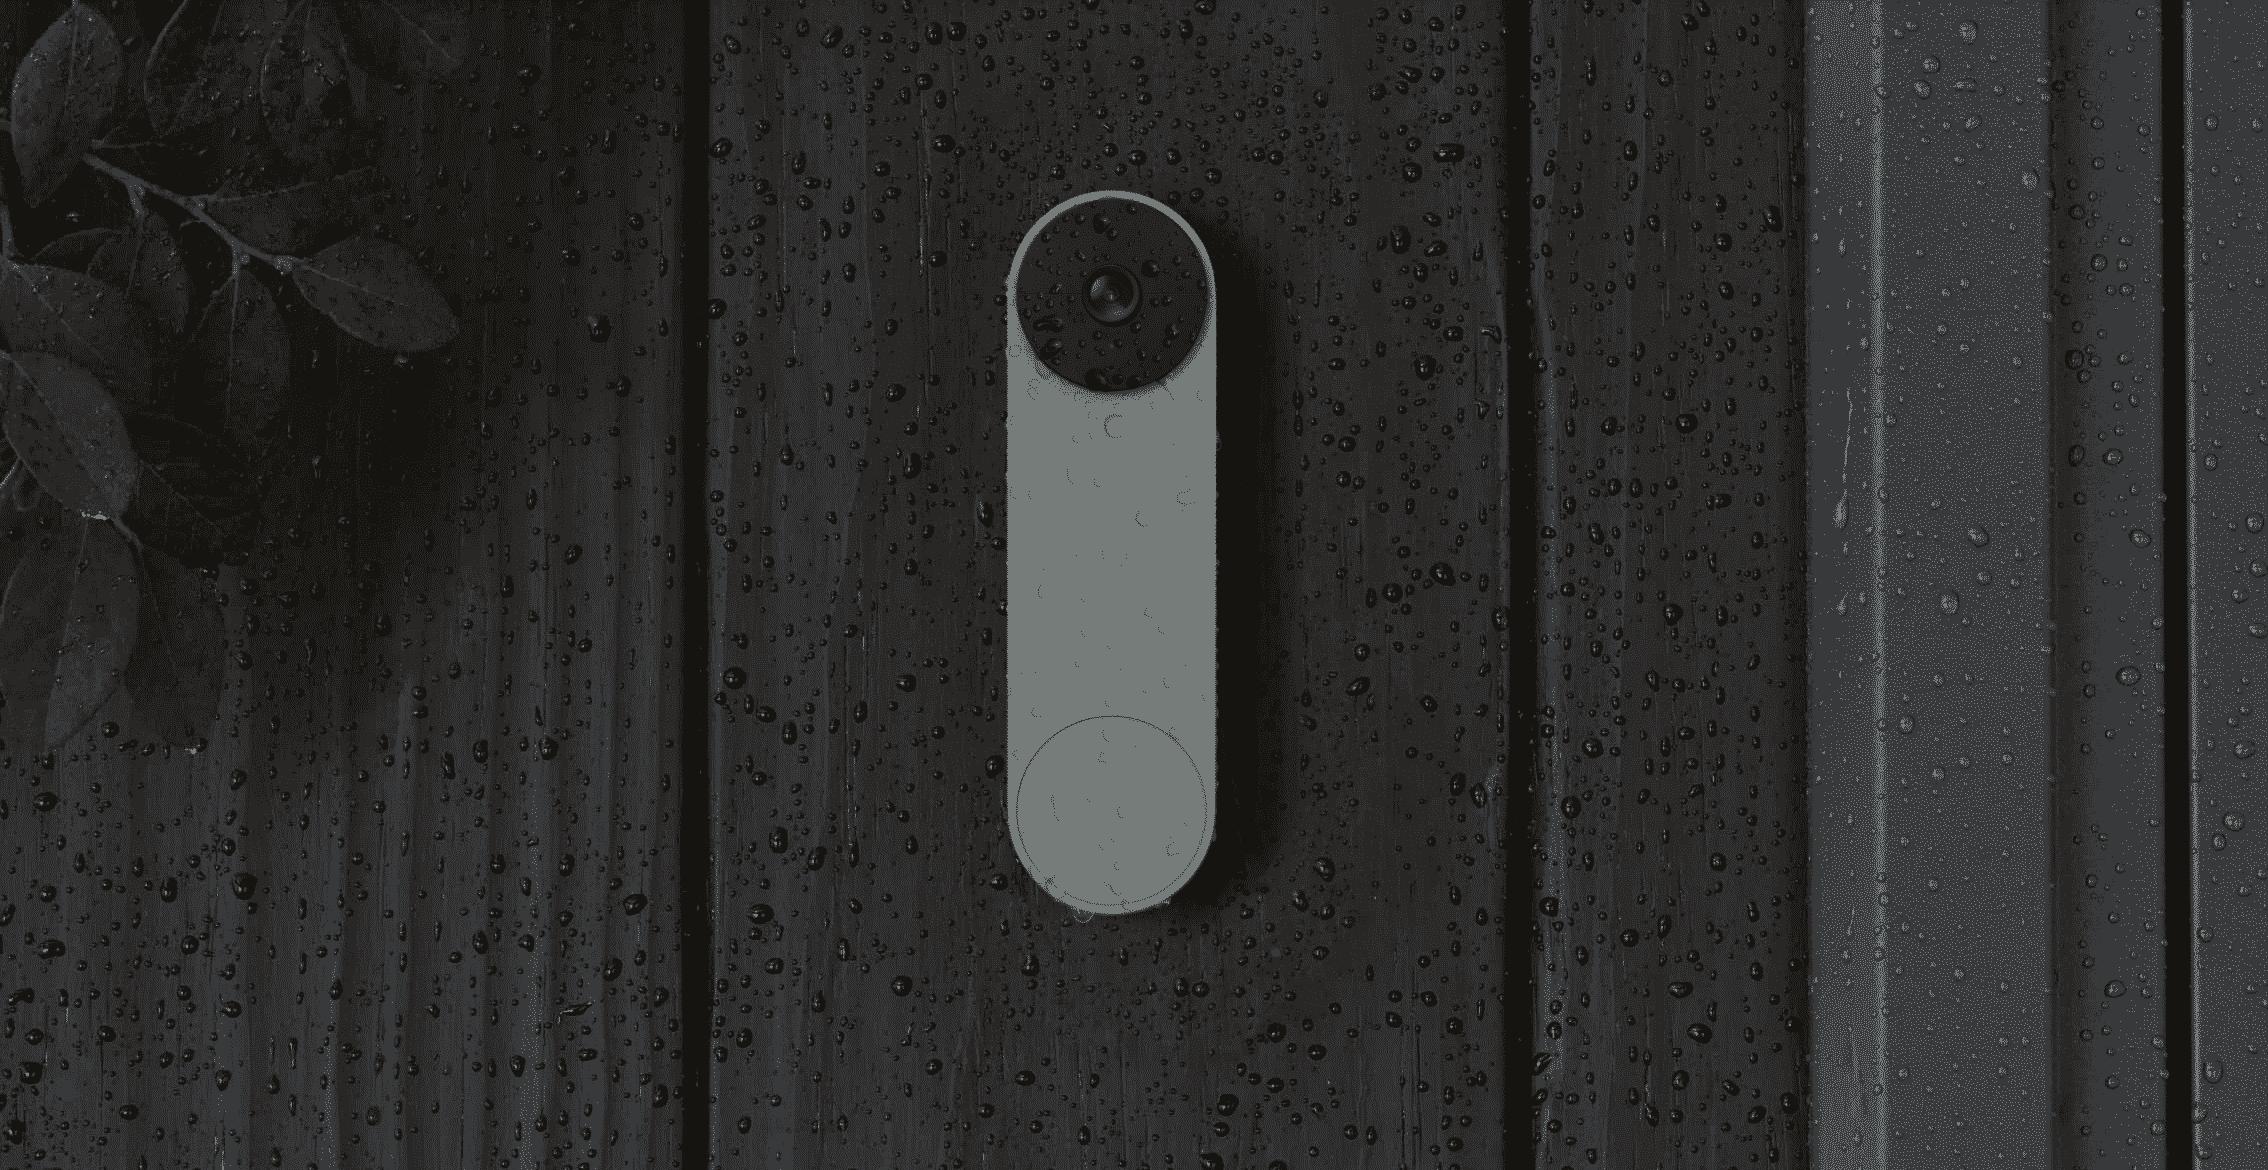 The new battery-powered Nest Doorbell